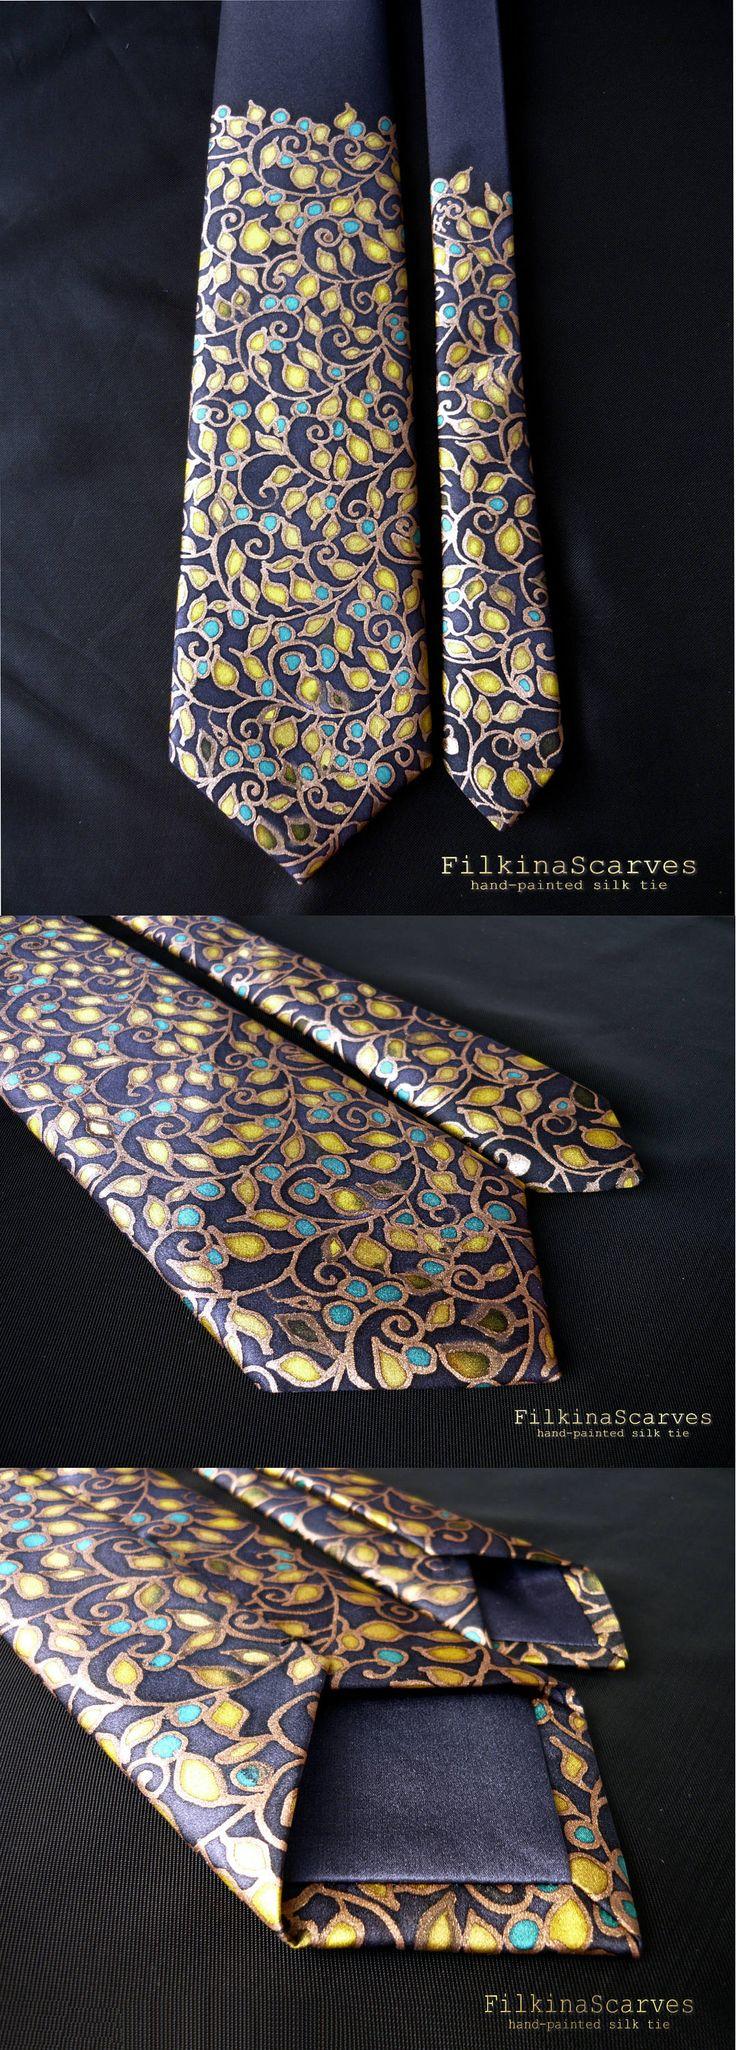 Mens tie Silk Necktie Hand Painted Navy Tie Mens Neckties Groomsman tie Silk Satin tie Mens Gifts Handpainted Tie Bisiness Wedding Tie FS 47 by FilkinaScarves on Etsy